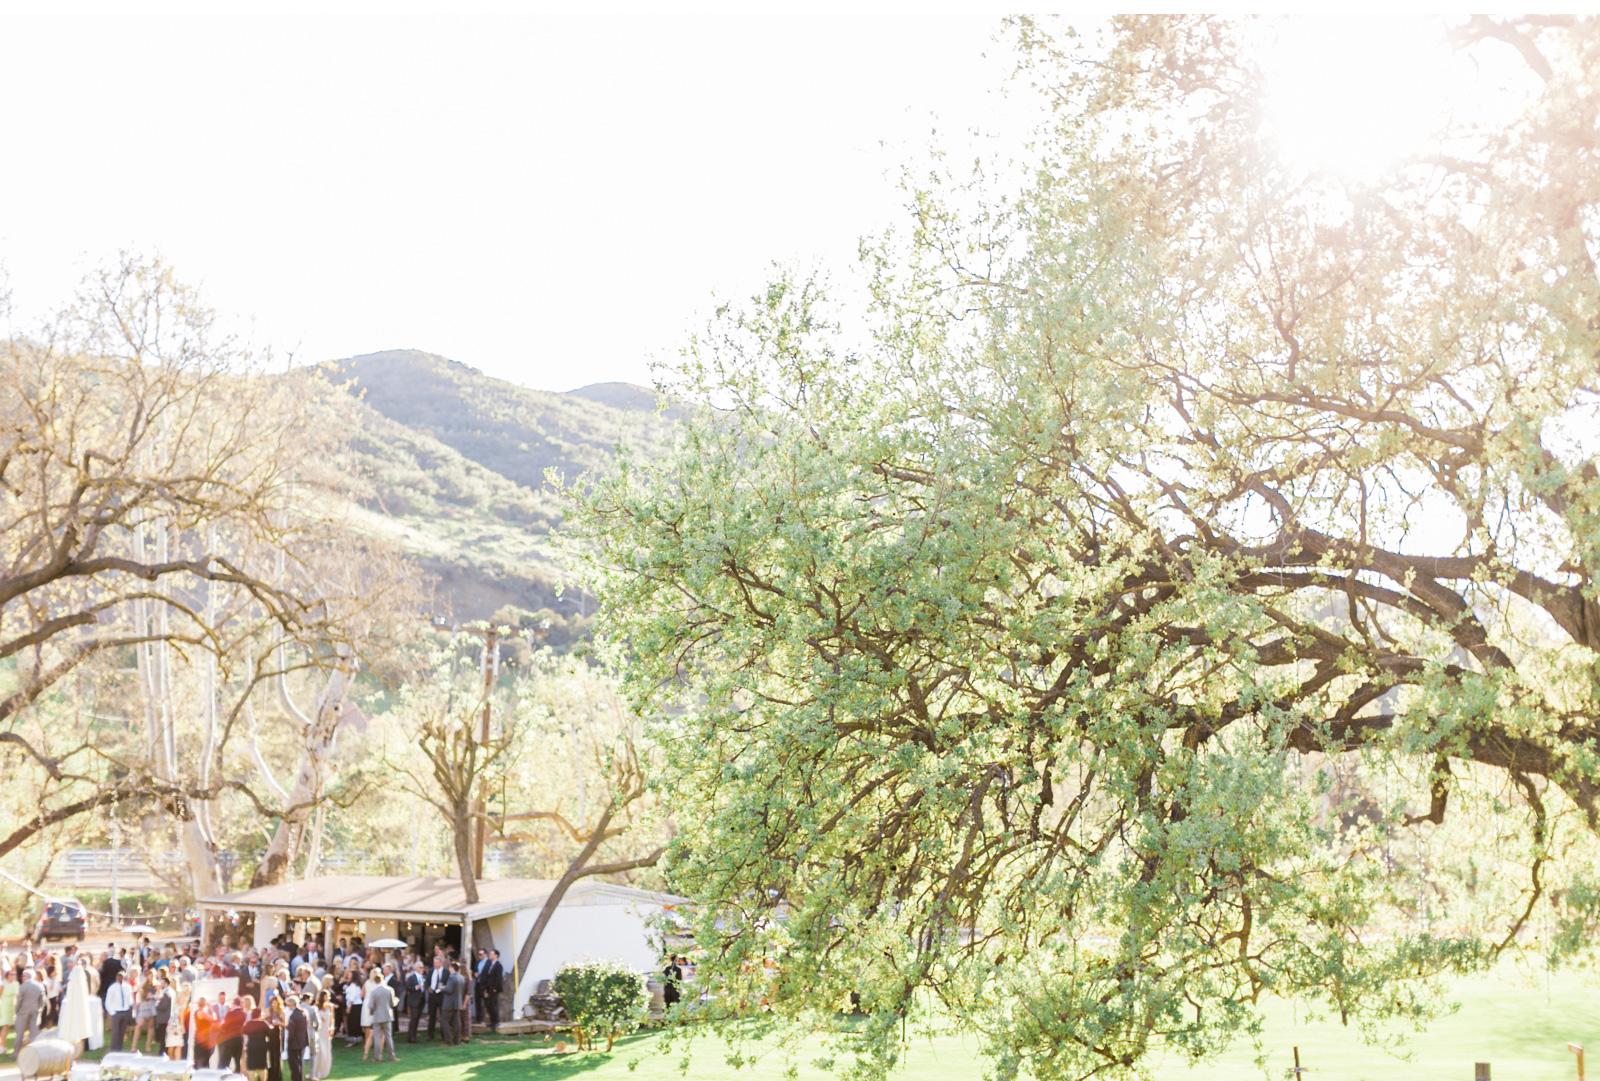 Triunfo-Creek-Malibu-Wedding-Natalie-Schutt-Photography-Couture-Events-Style-Me-Pretty_10.jpg